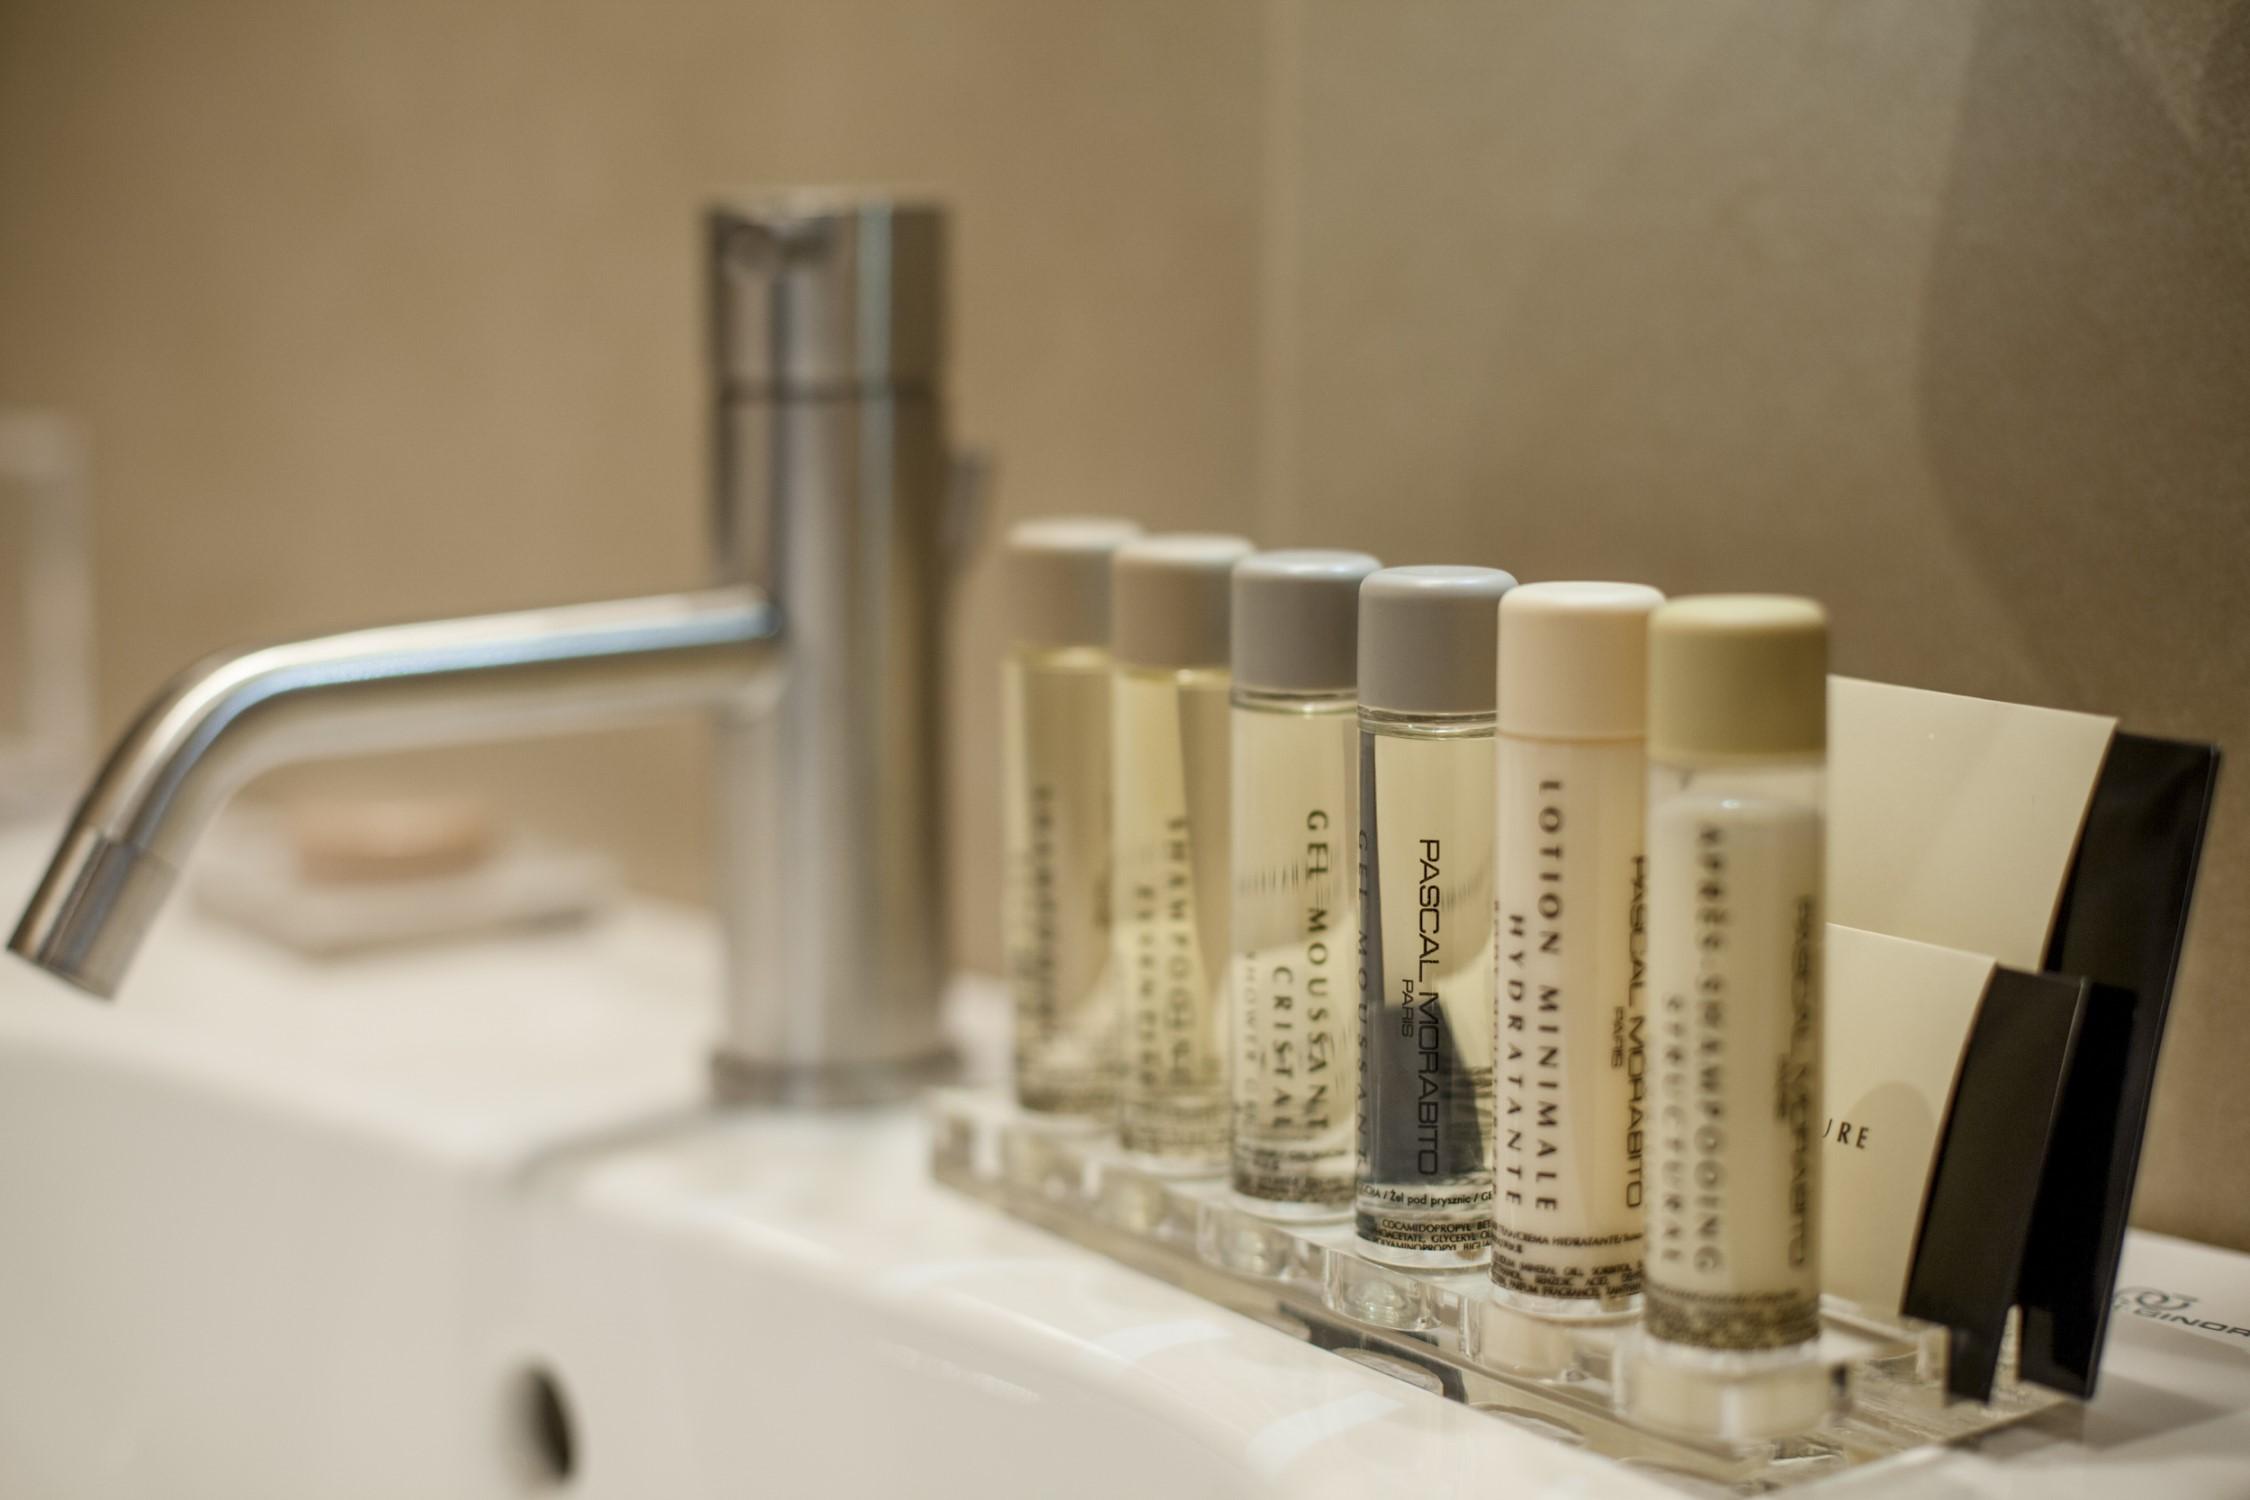 Linea Cortesia pascal Morabito Hotel 900 Giulianova Servizi Charme Luxury Business Leisure Vacanza